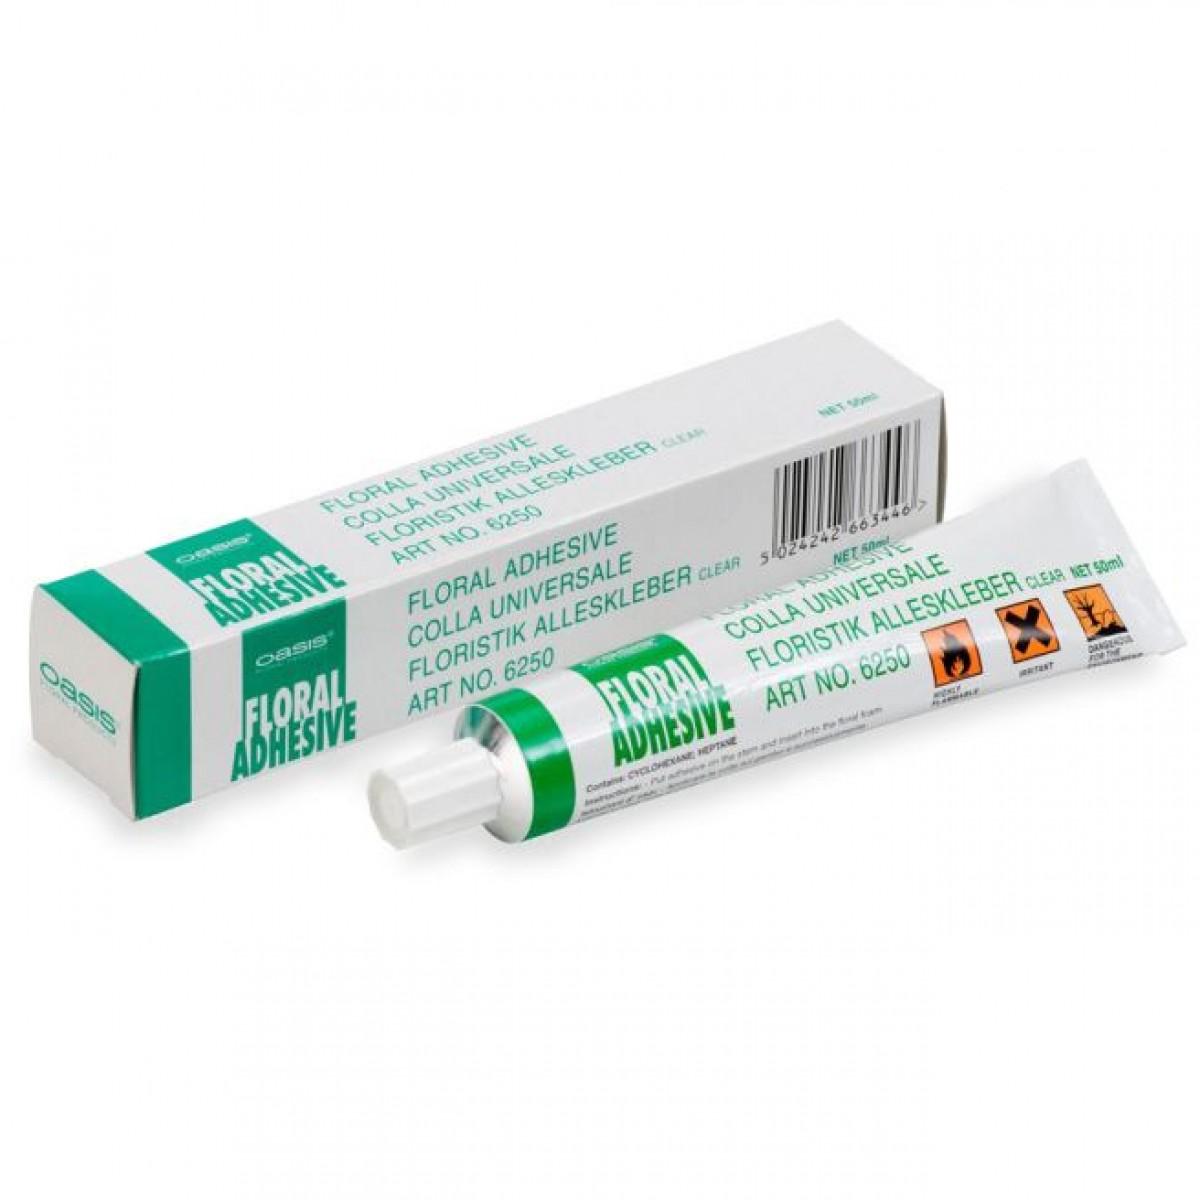 4901 HM Adhesive Tube Transparent 39gms (1 No)